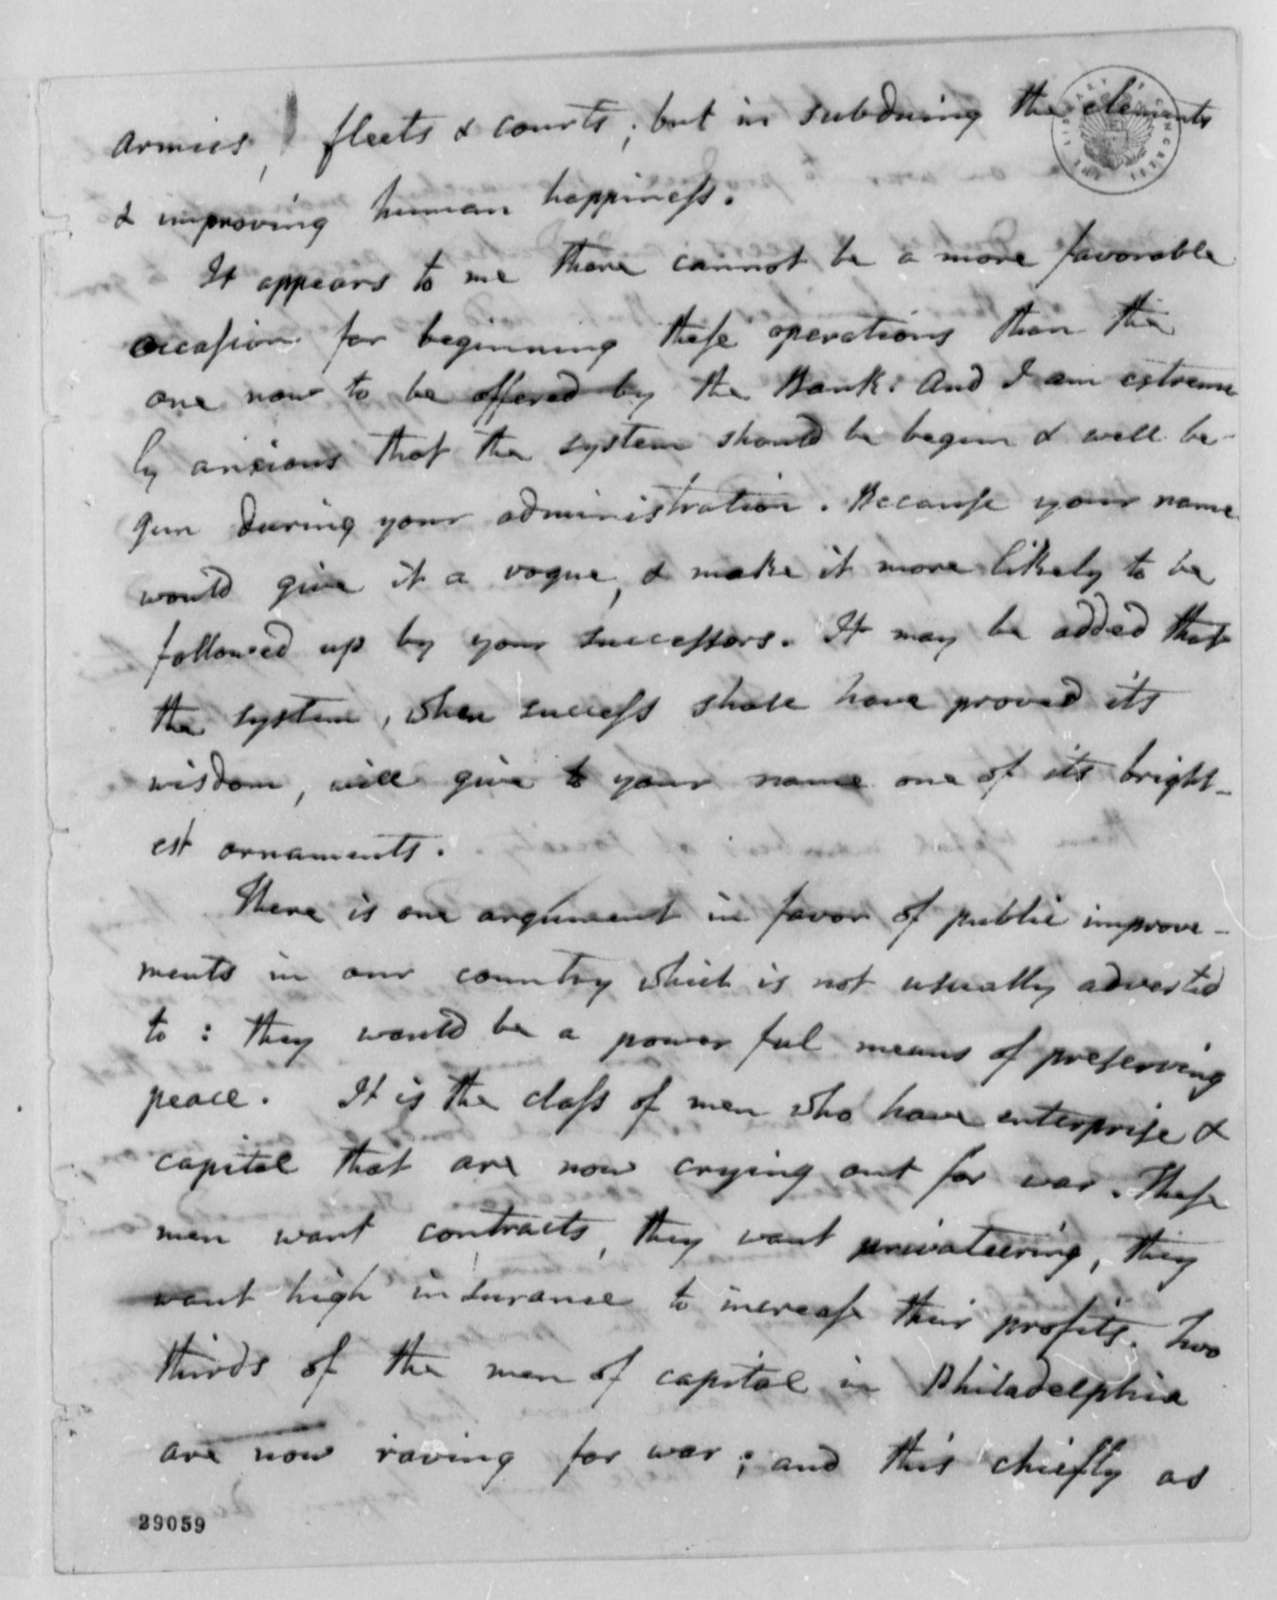 Joel Barlow to Thomas Jefferson, February 25, 1807